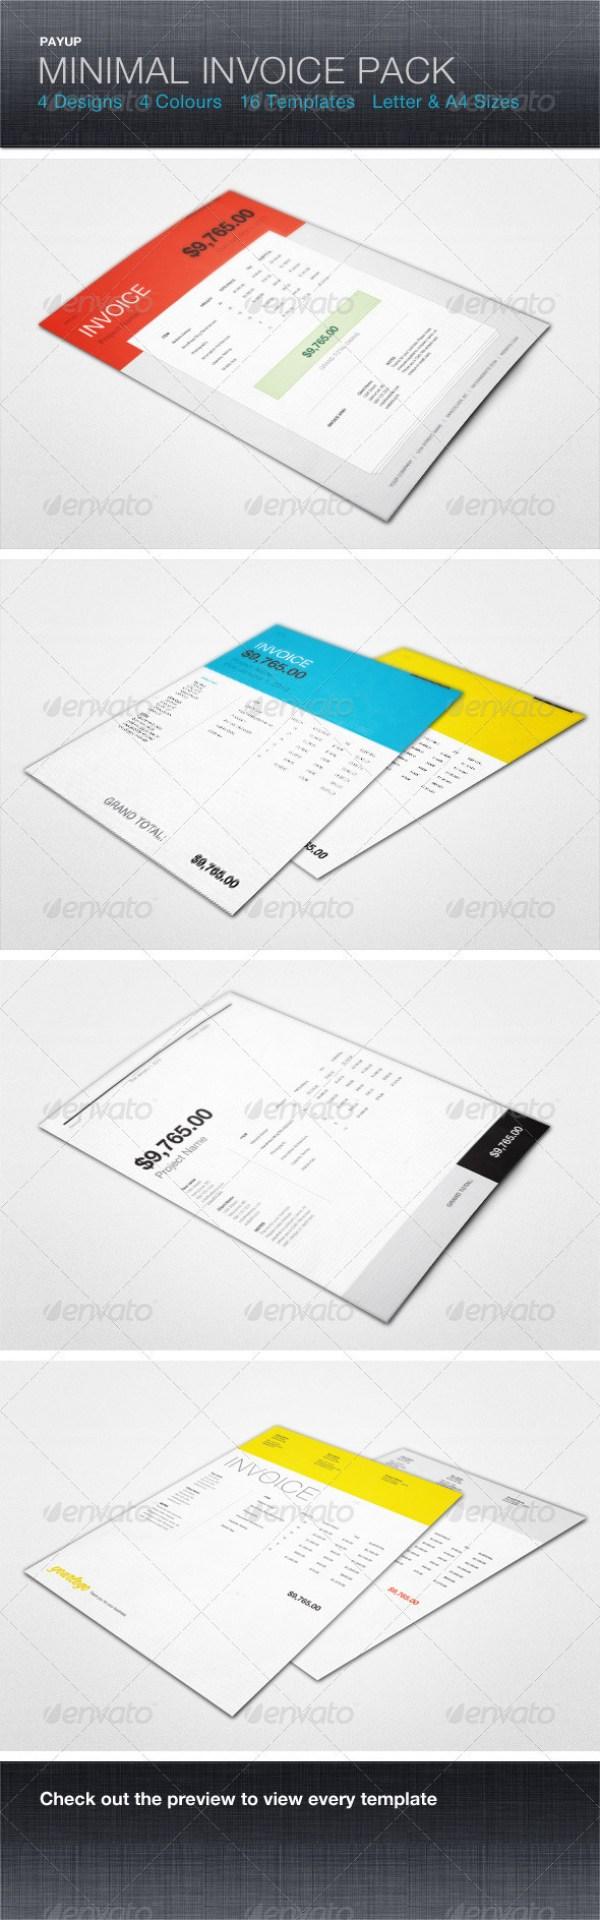 minimal Invoice Template Pack